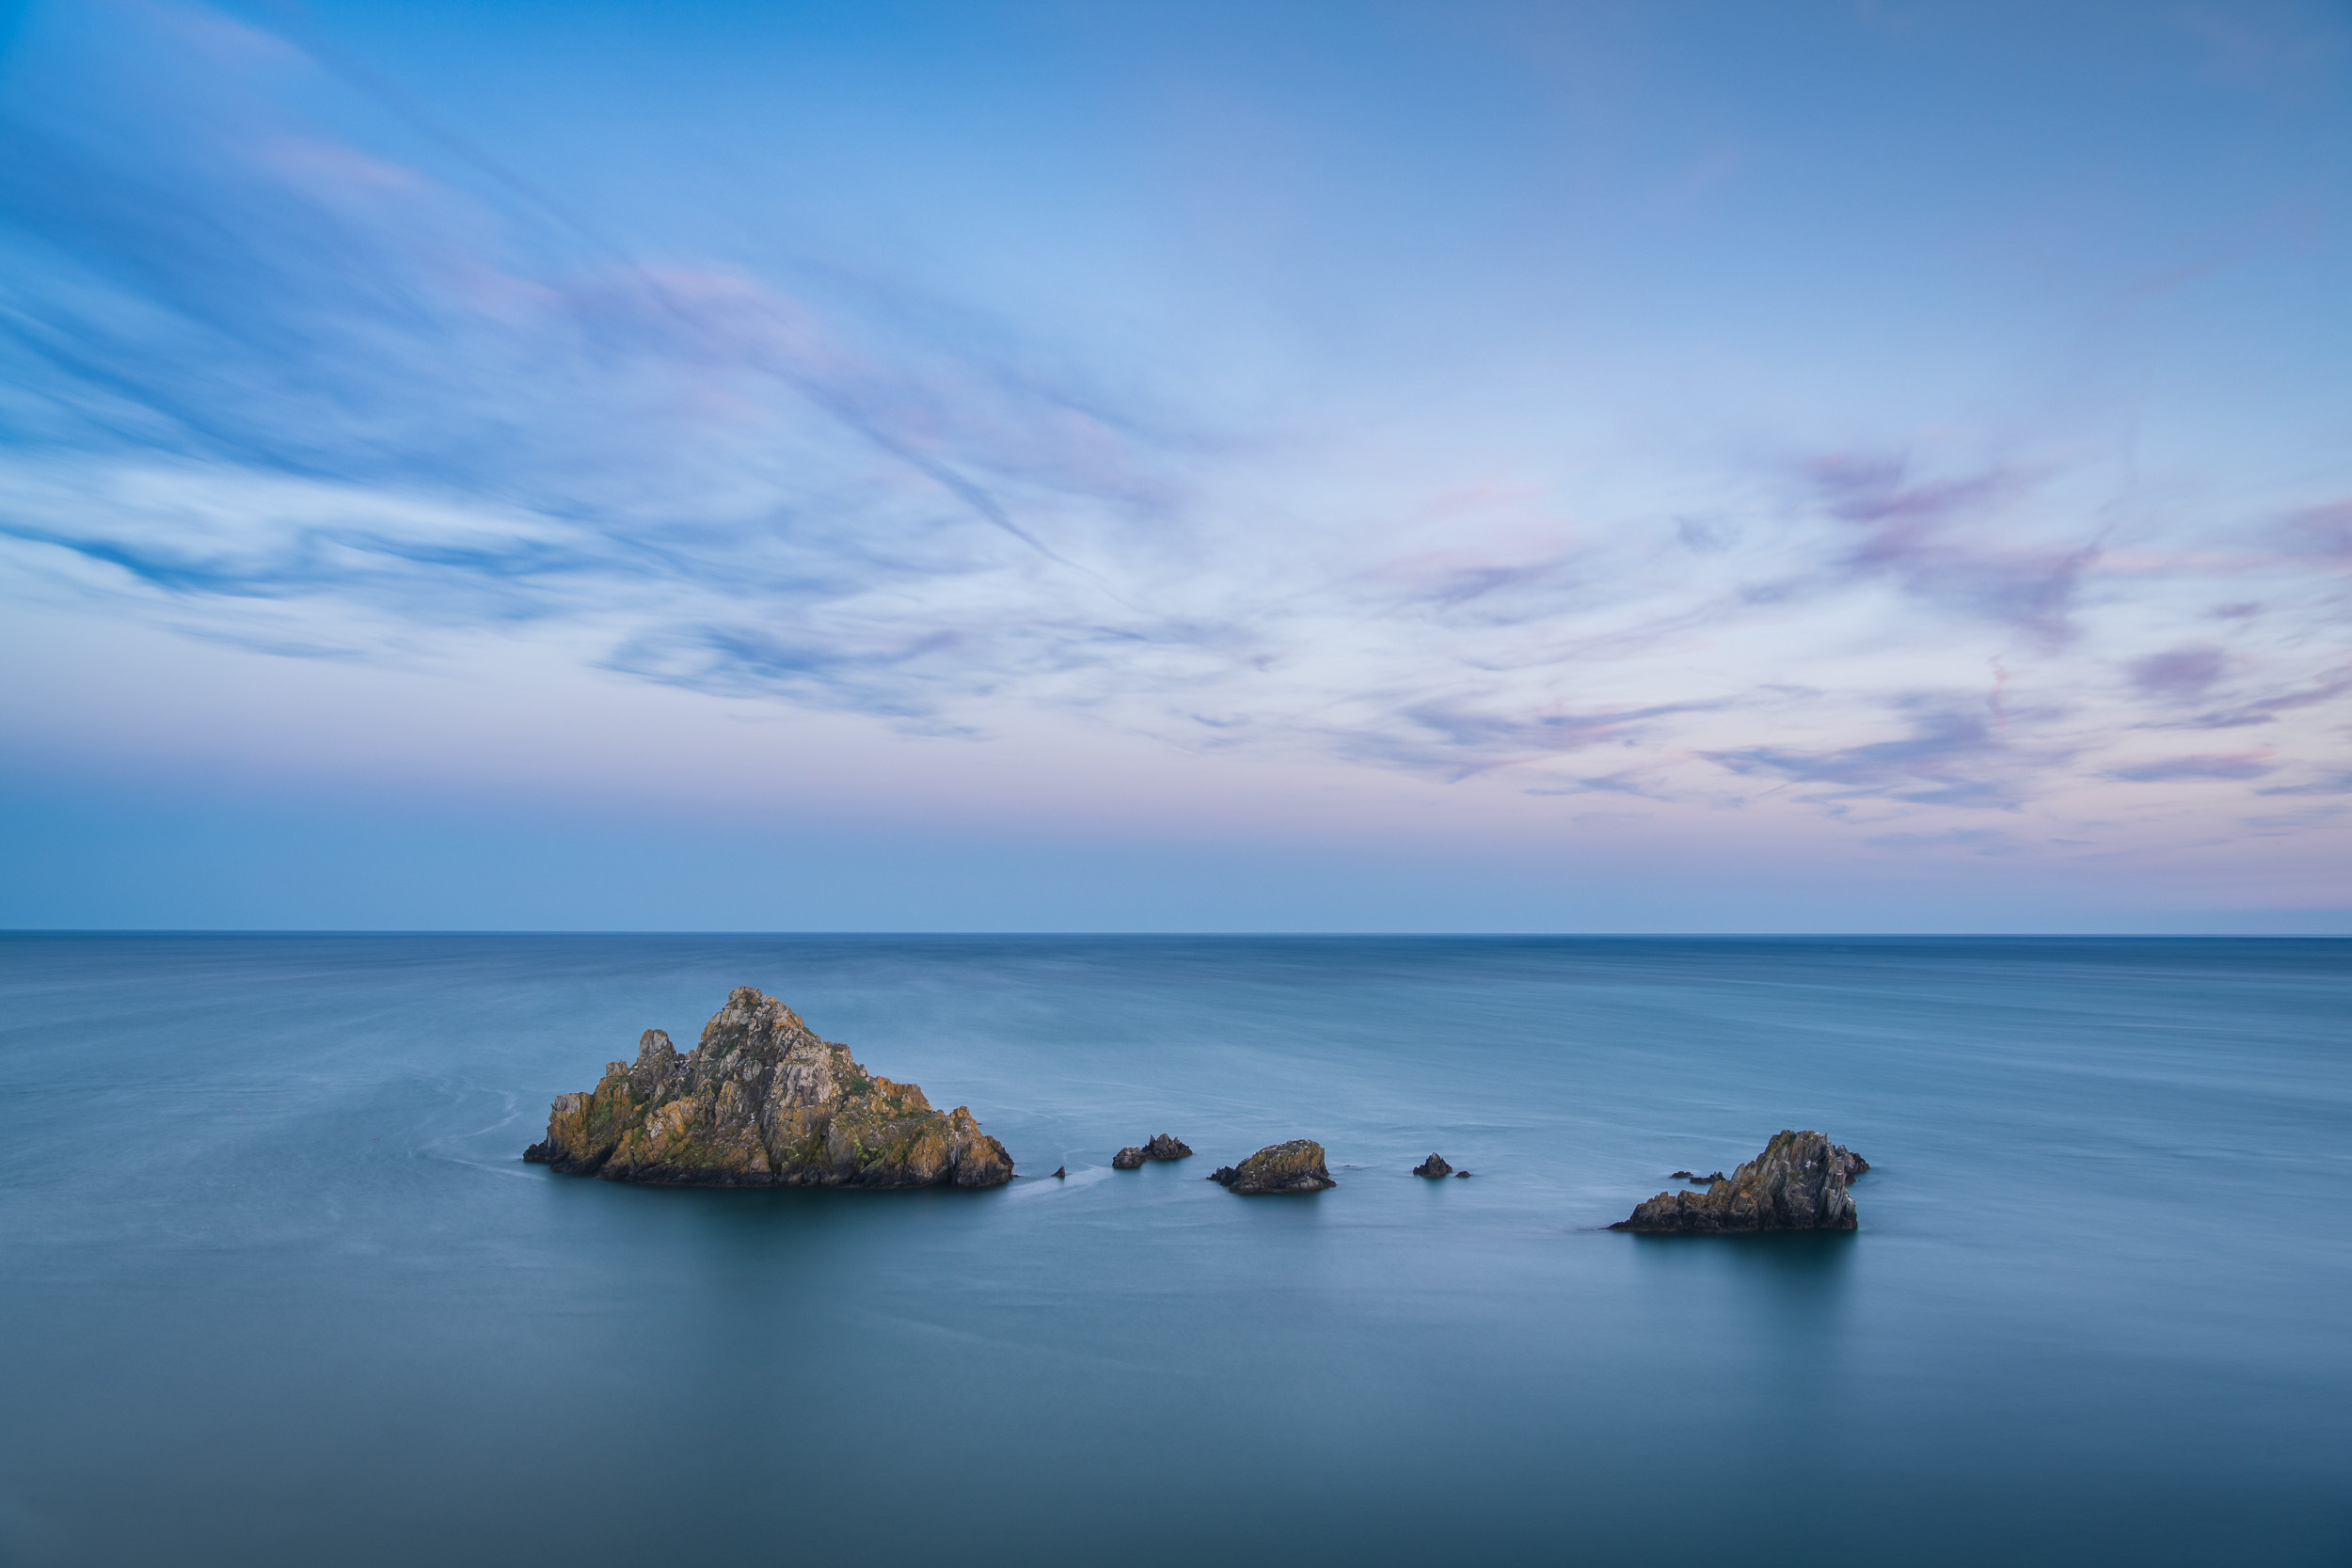 Islands in the Blue  - Froward Point, Devon: Nikon D850, Nikkor 24-70 mm f/2.8 at 29 mm, 40 secs at f/11, ISO 64, Lee Filters Circular Polariser.